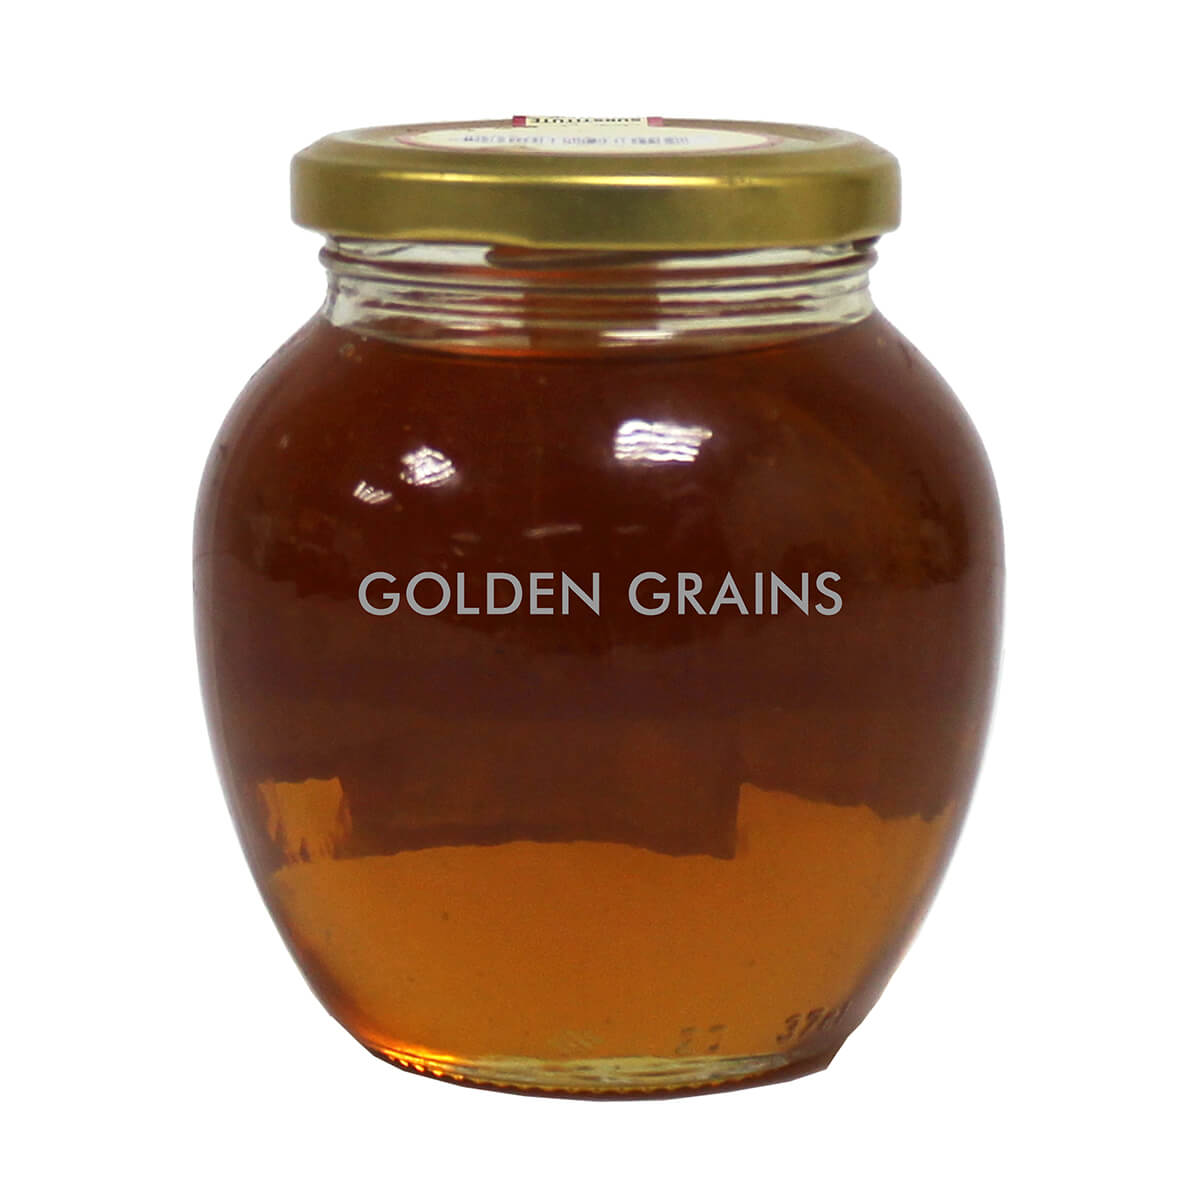 Golden Grains Mediterranea - Honey Sub - 500G - Turkey - Back.jpg